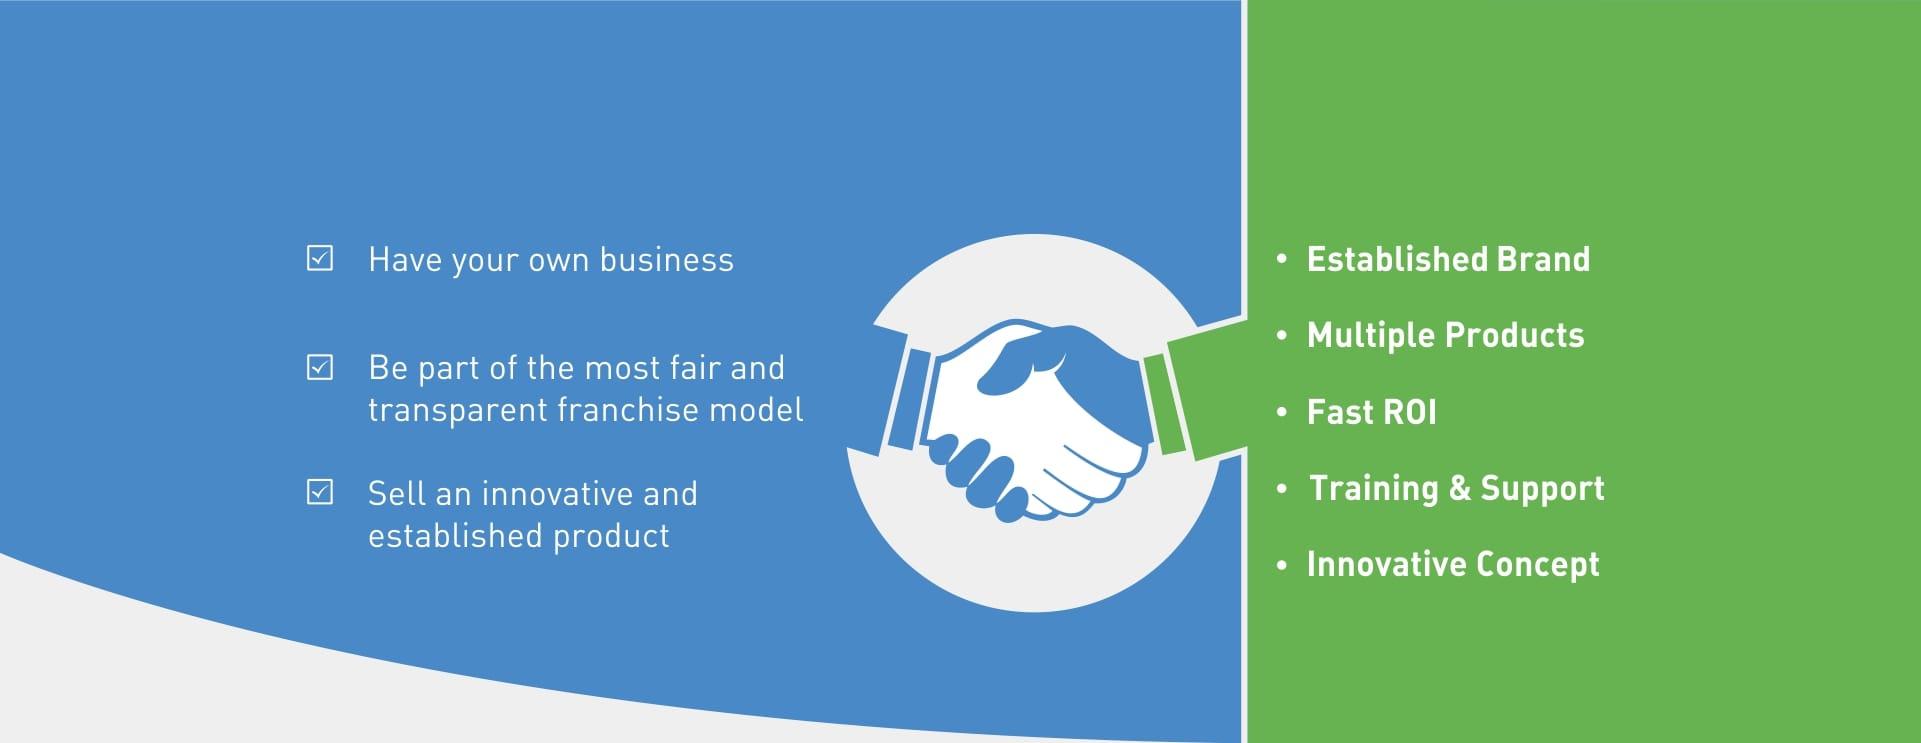 Big V Telecom Franchisee Business